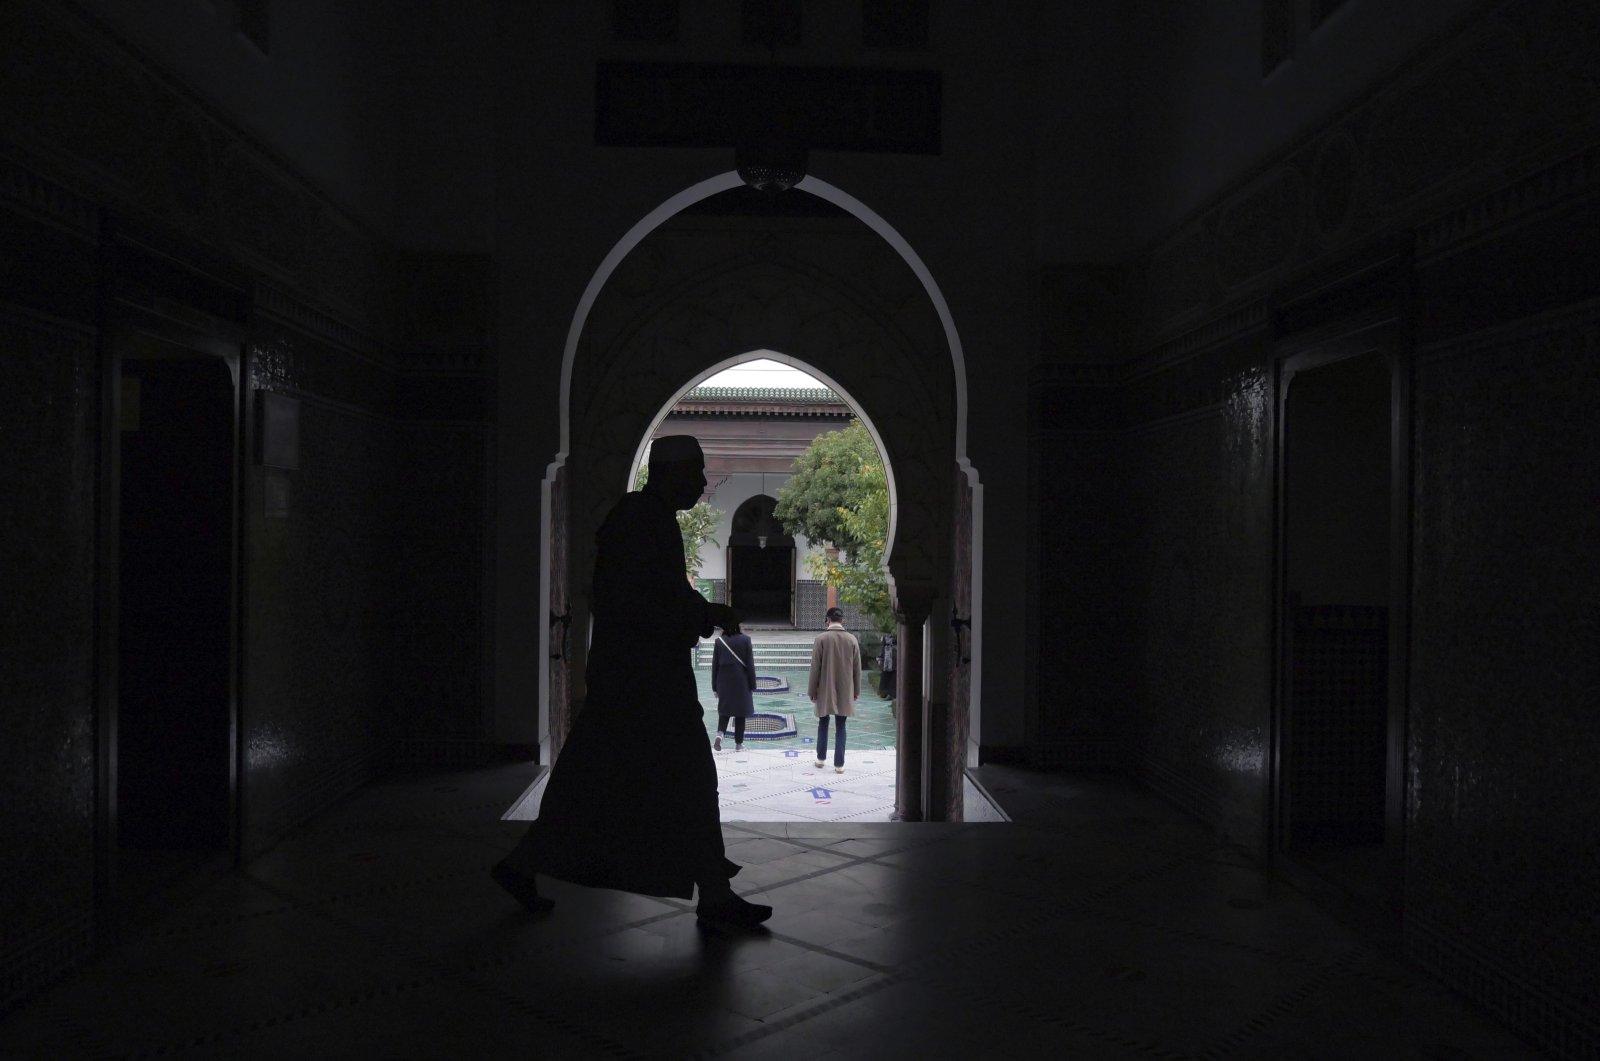 A Muslim walks inside Grand Mosque of Paris, Paris, France, Oct. 29, 2020. (AP Photo)